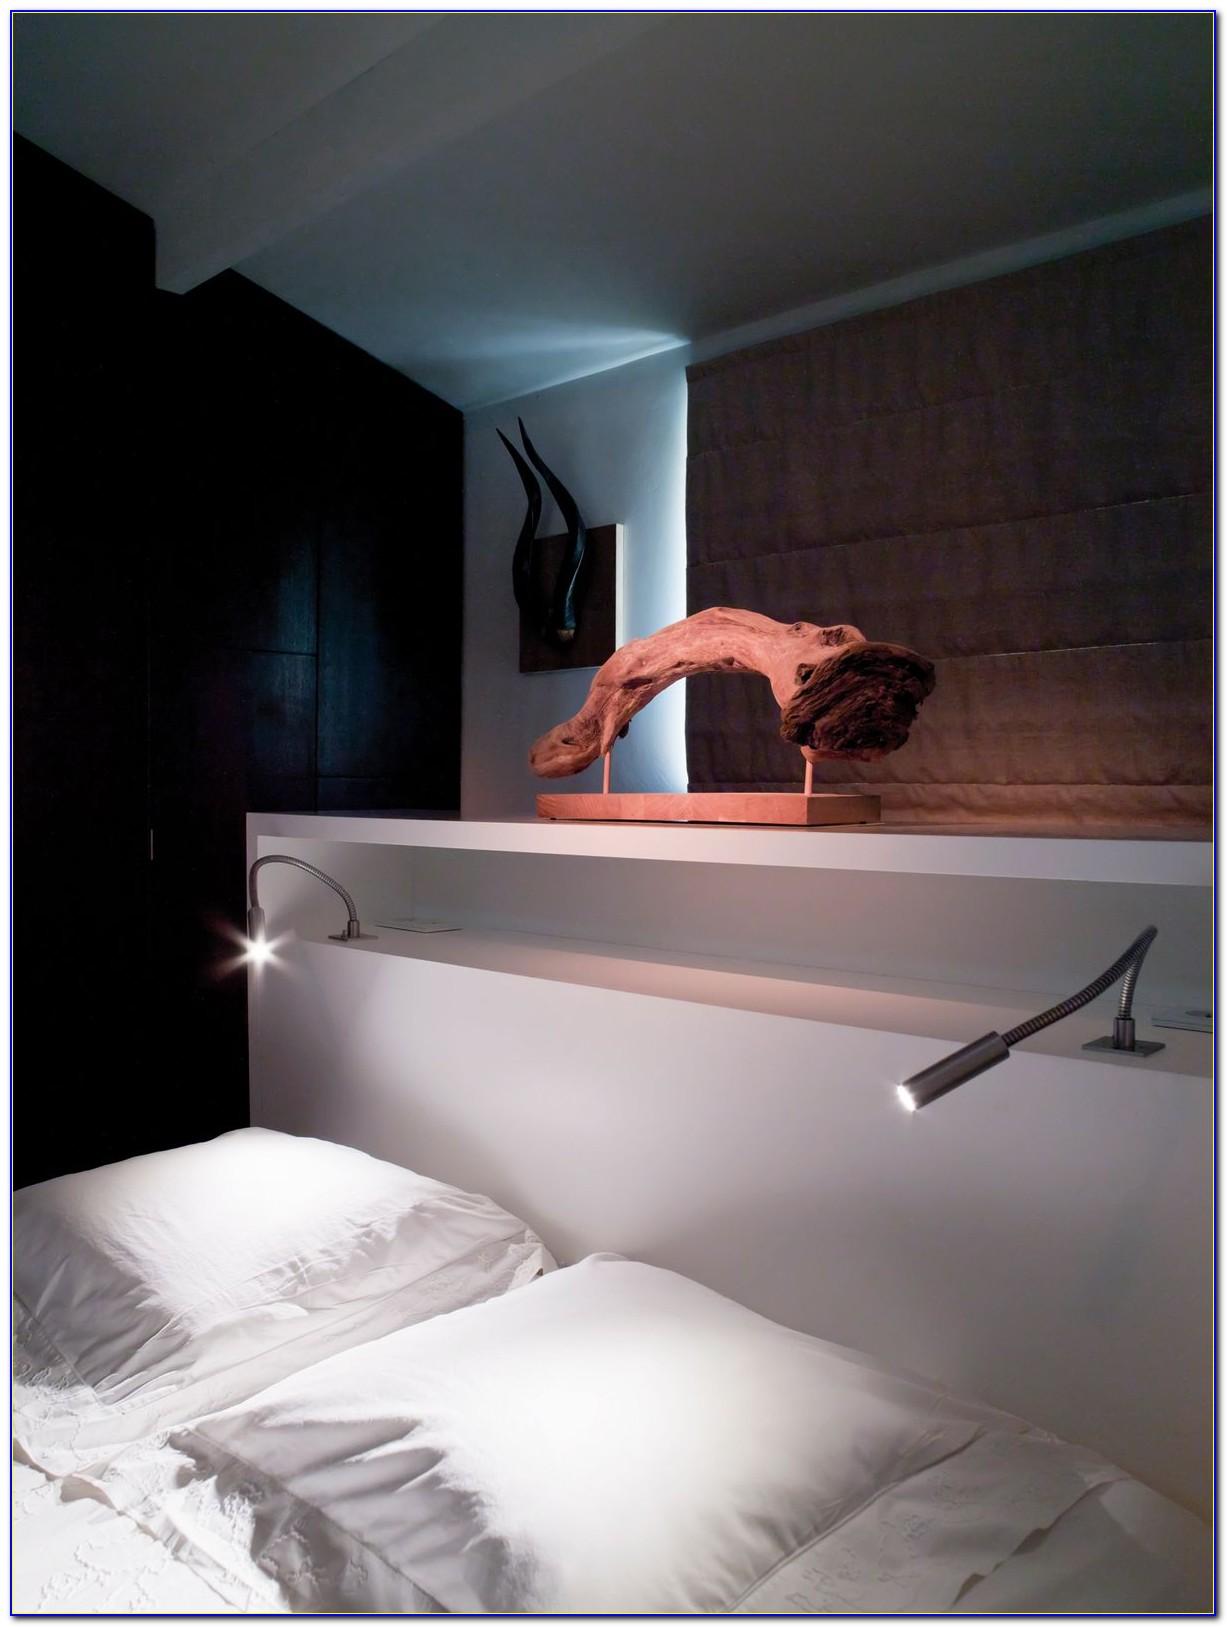 Bed Lamp Led Reading Light Mounts On Headboard